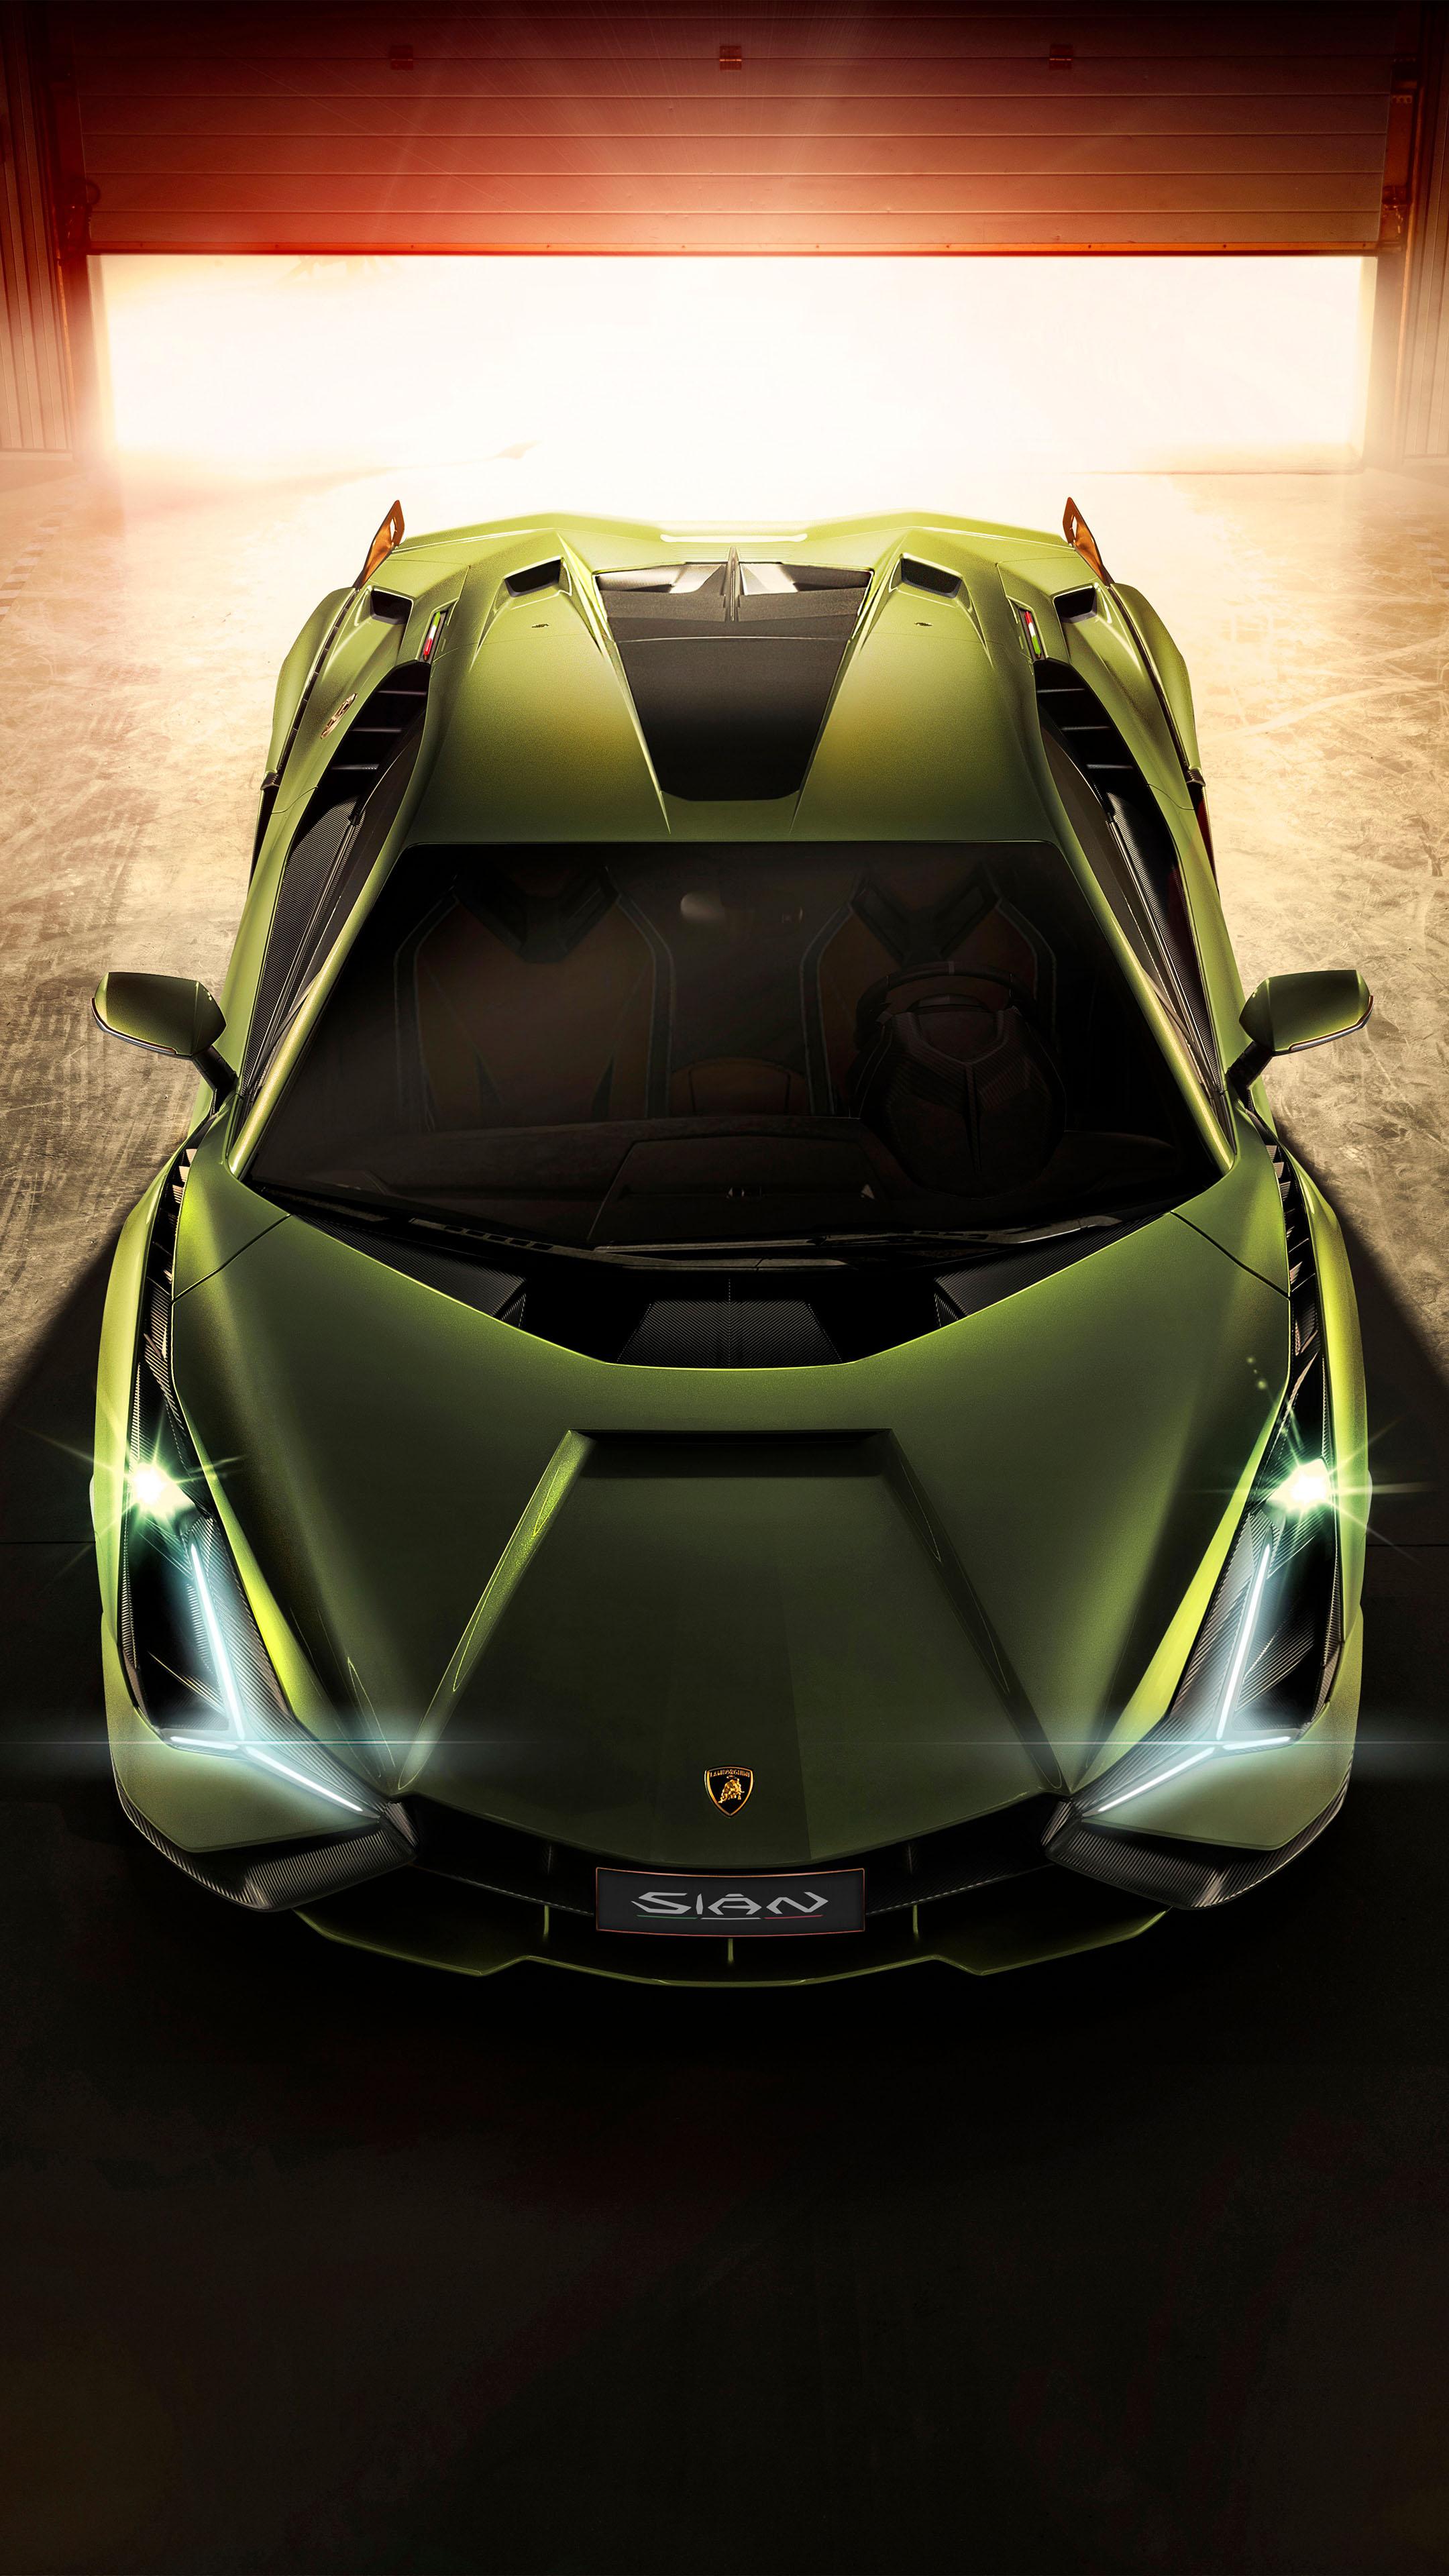 Lamborghini Sian 2019 Free 4K Ultra HD Mobile Wallpaper